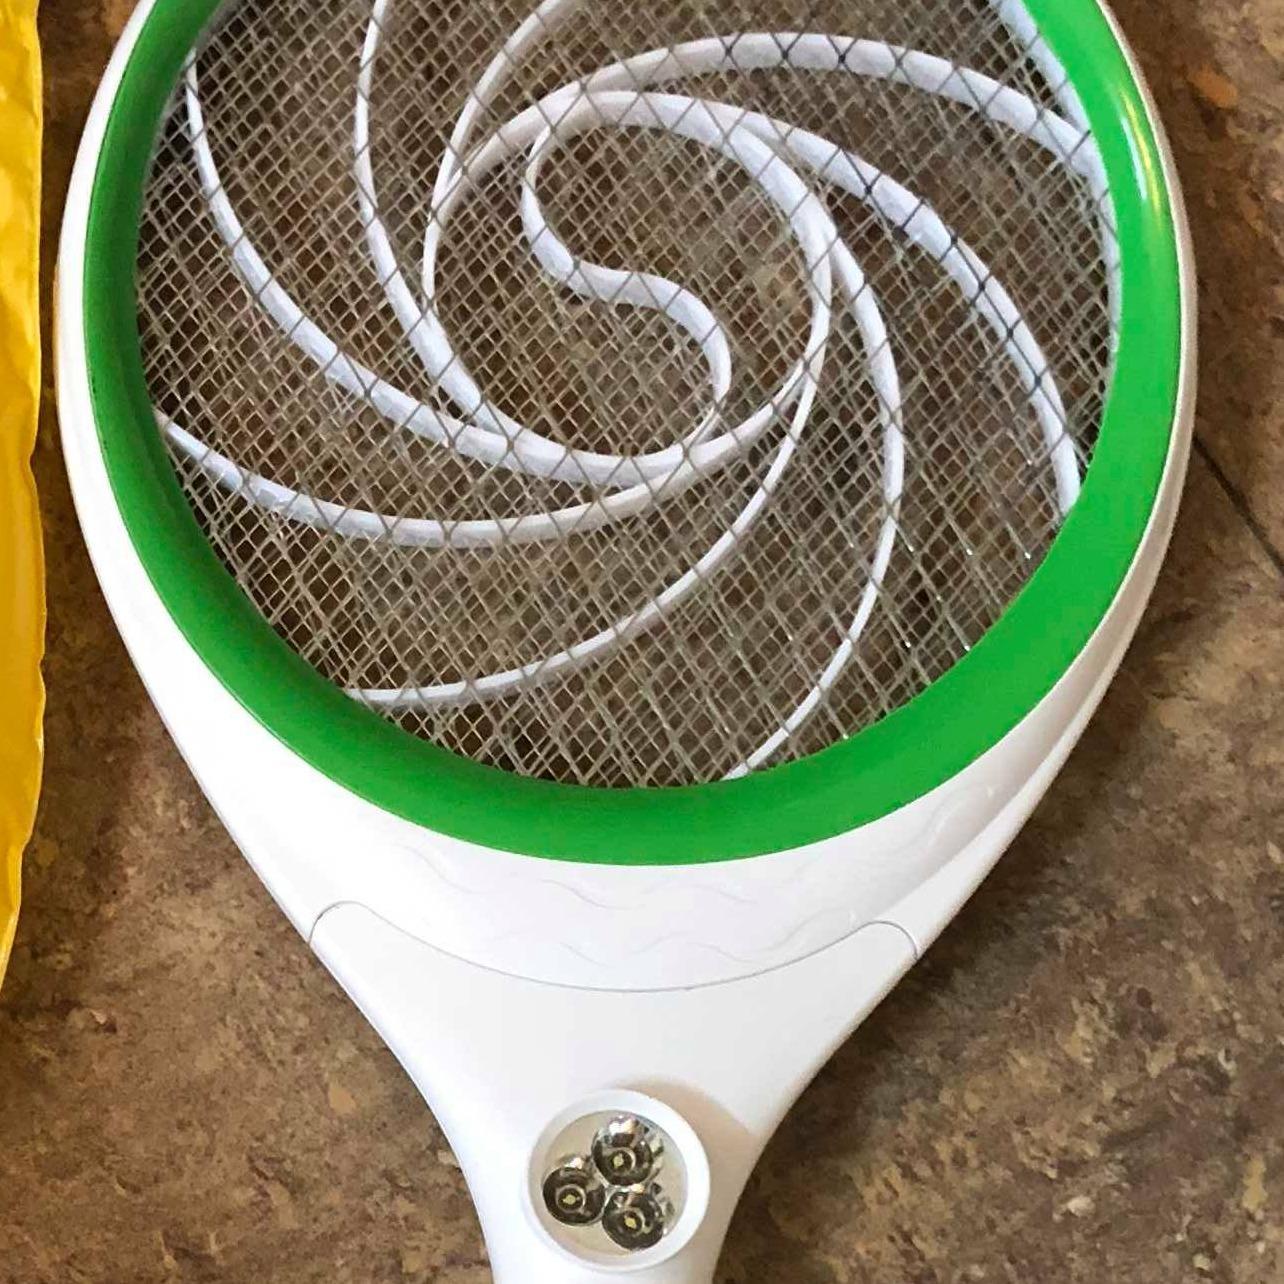 Vợt bắt muỗi A Huy